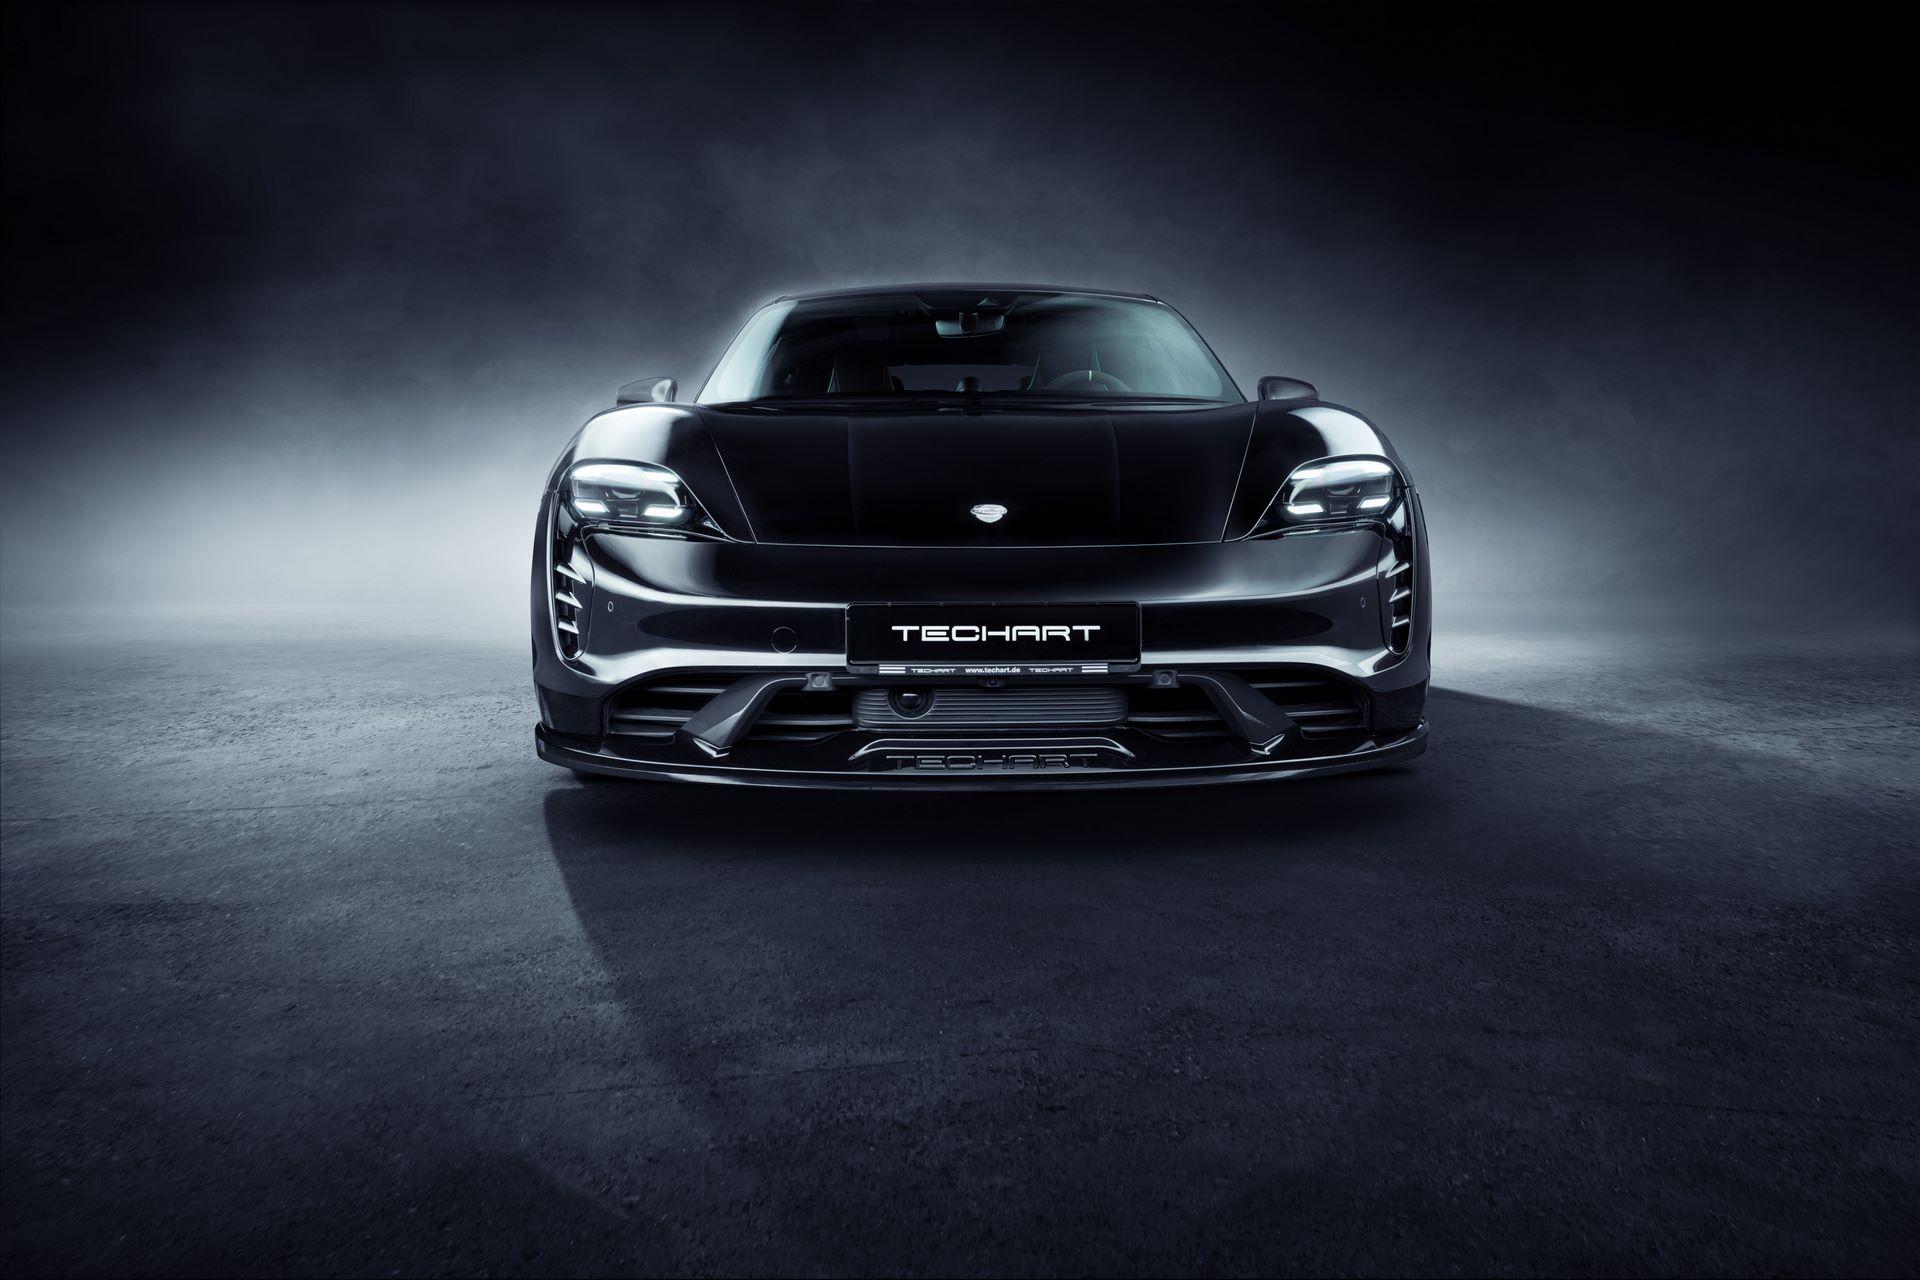 Porsche-Taycan-bodykit-by-TechArt-16